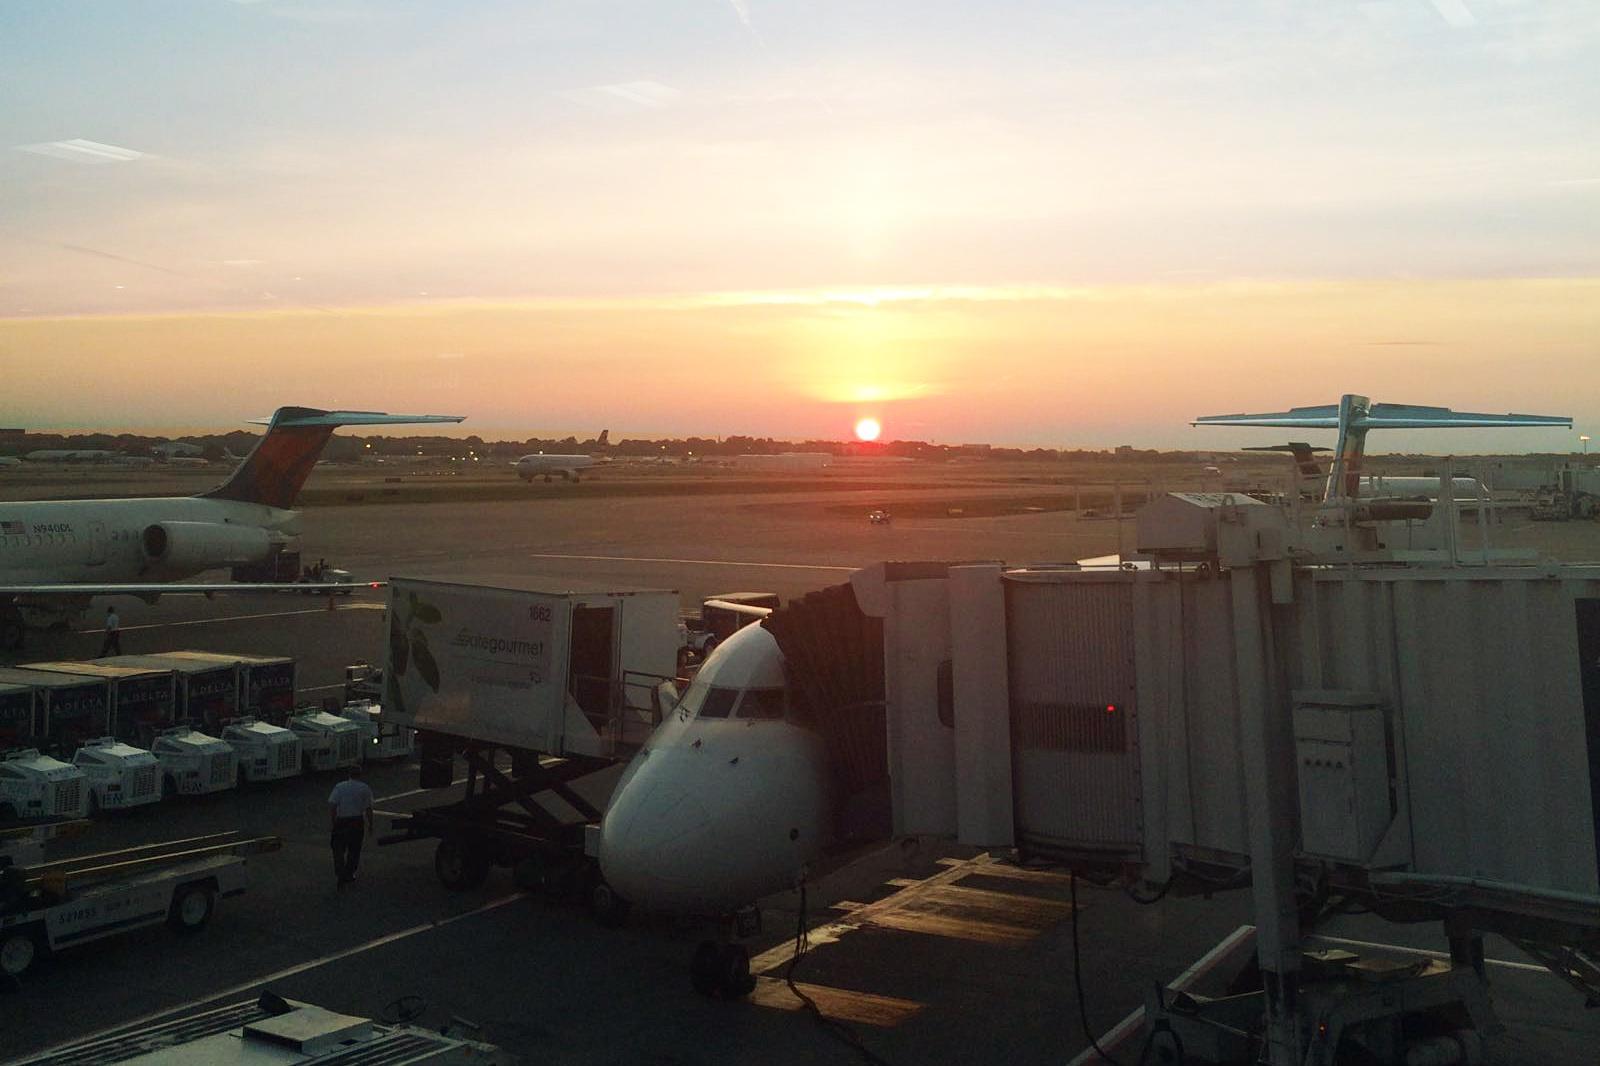 Travel_airport.jpg